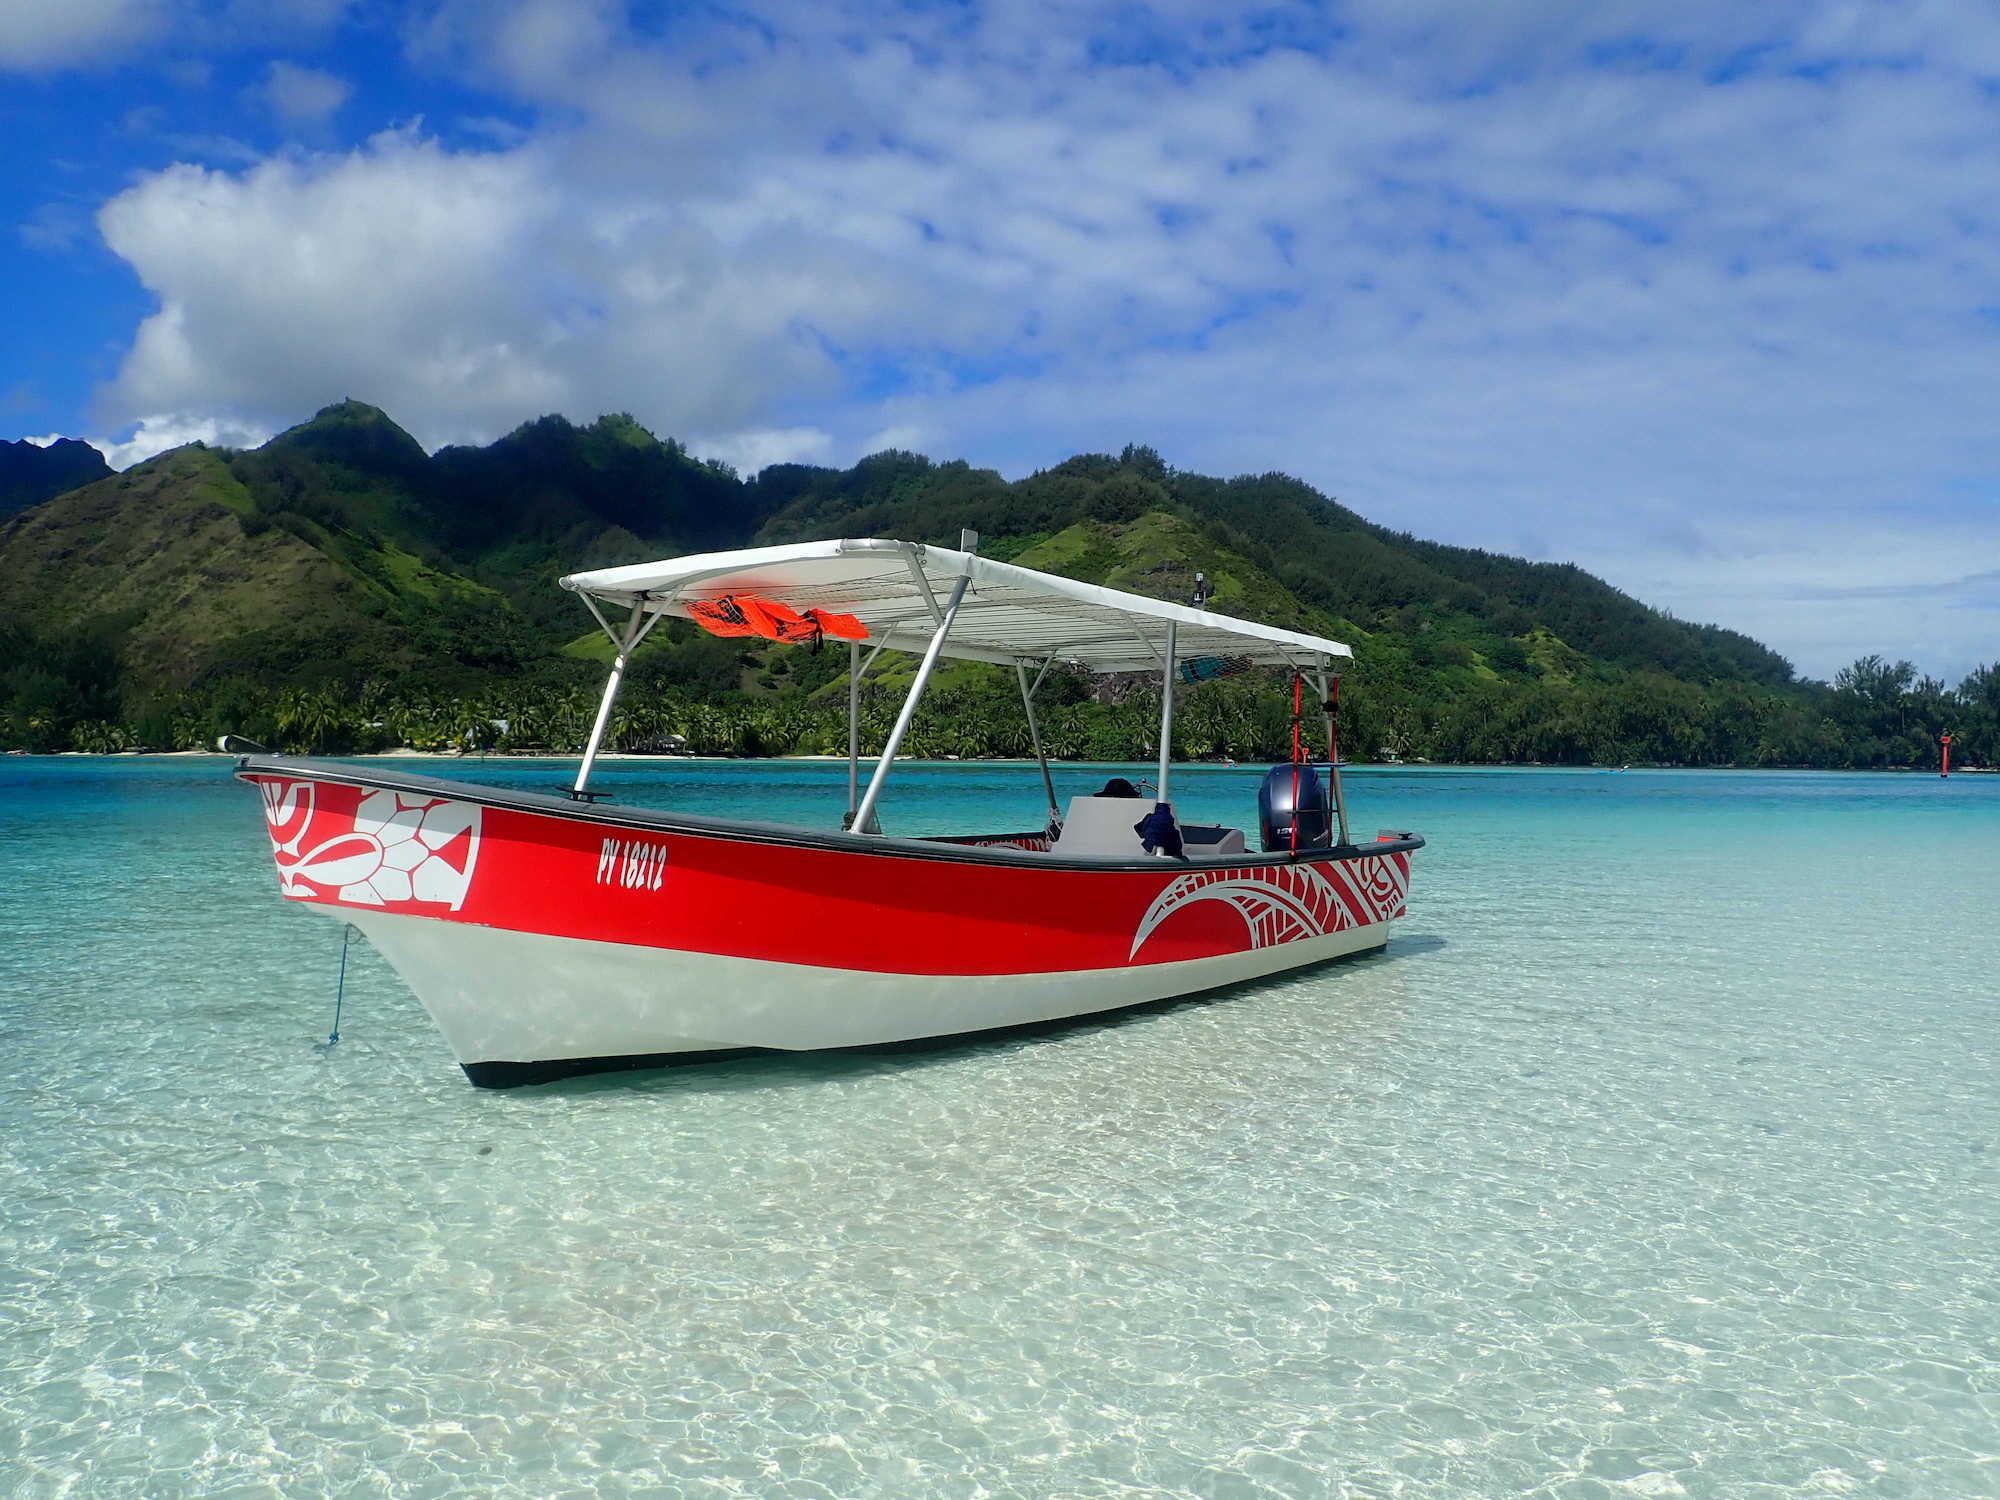 https://tahititourisme.com.au/wp-content/uploads/2020/09/Boat-Hinaloa.jpg